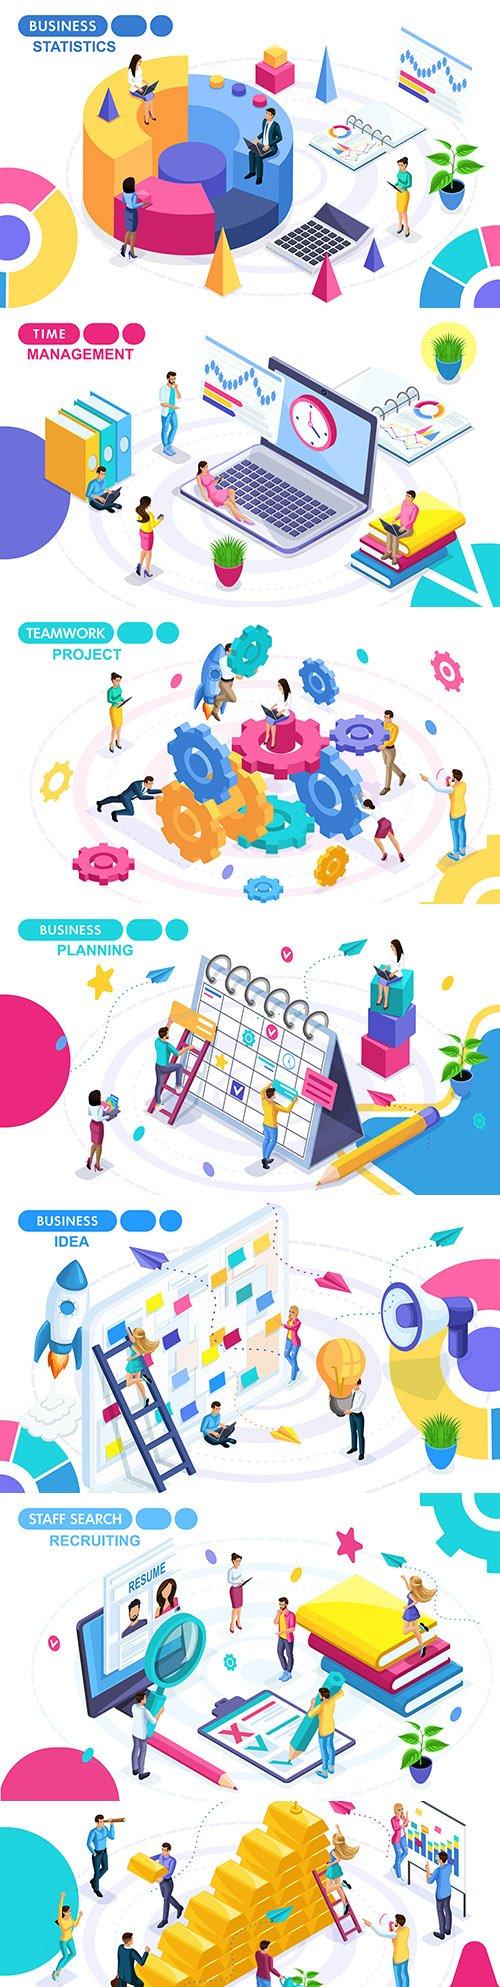 People business plan development isometric concept